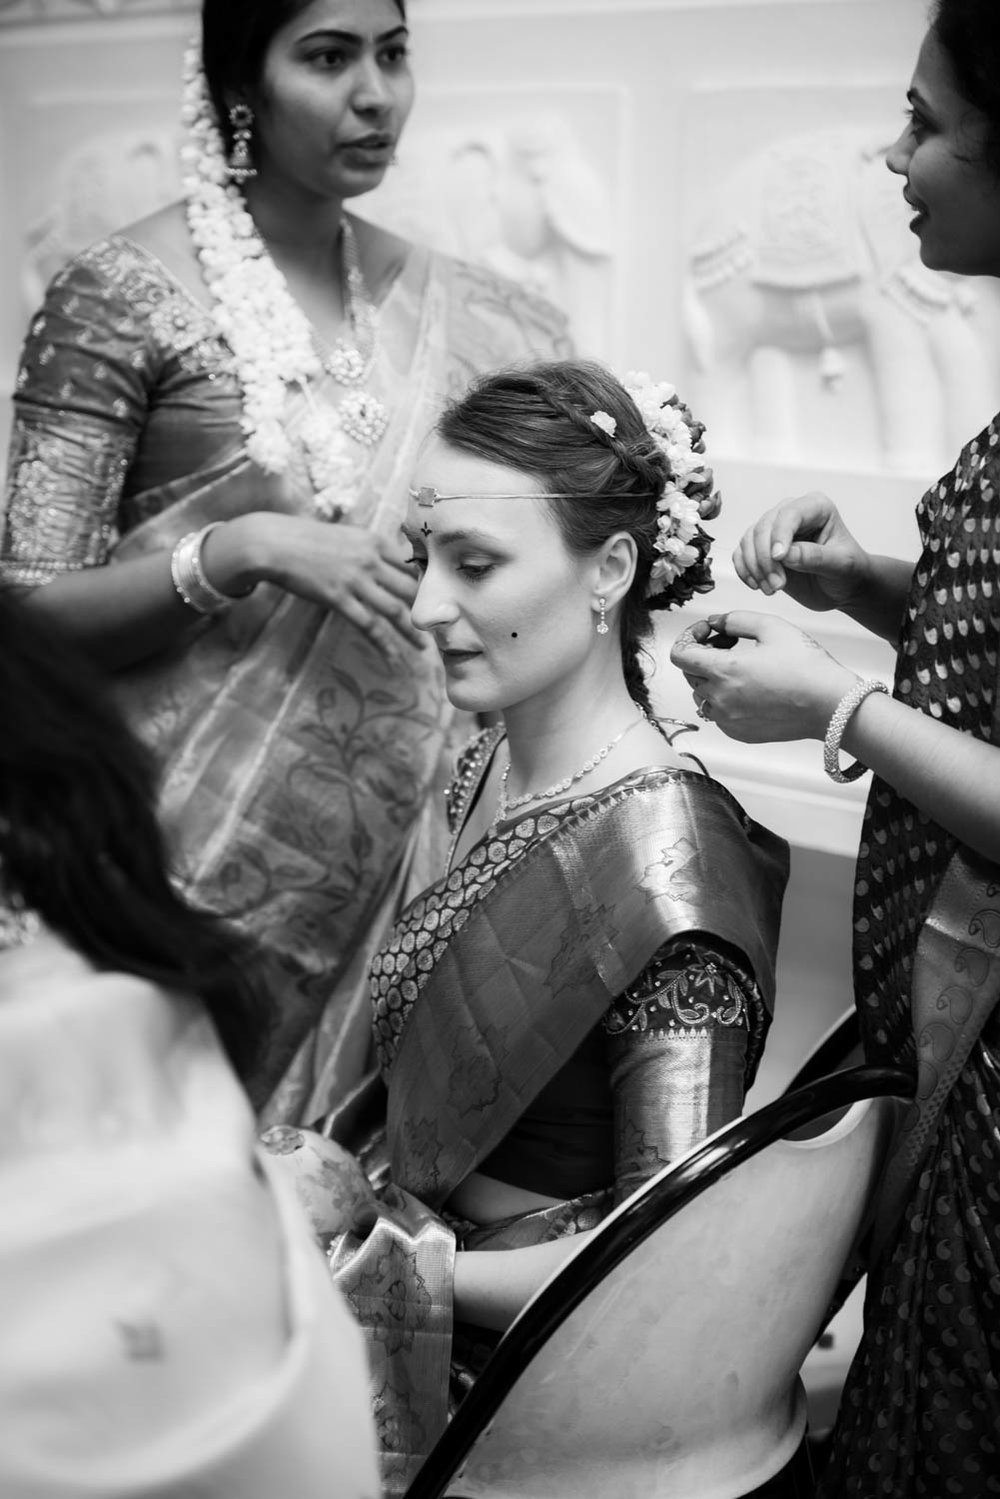 ecaterina-chandu-indian-wedding4.jpg